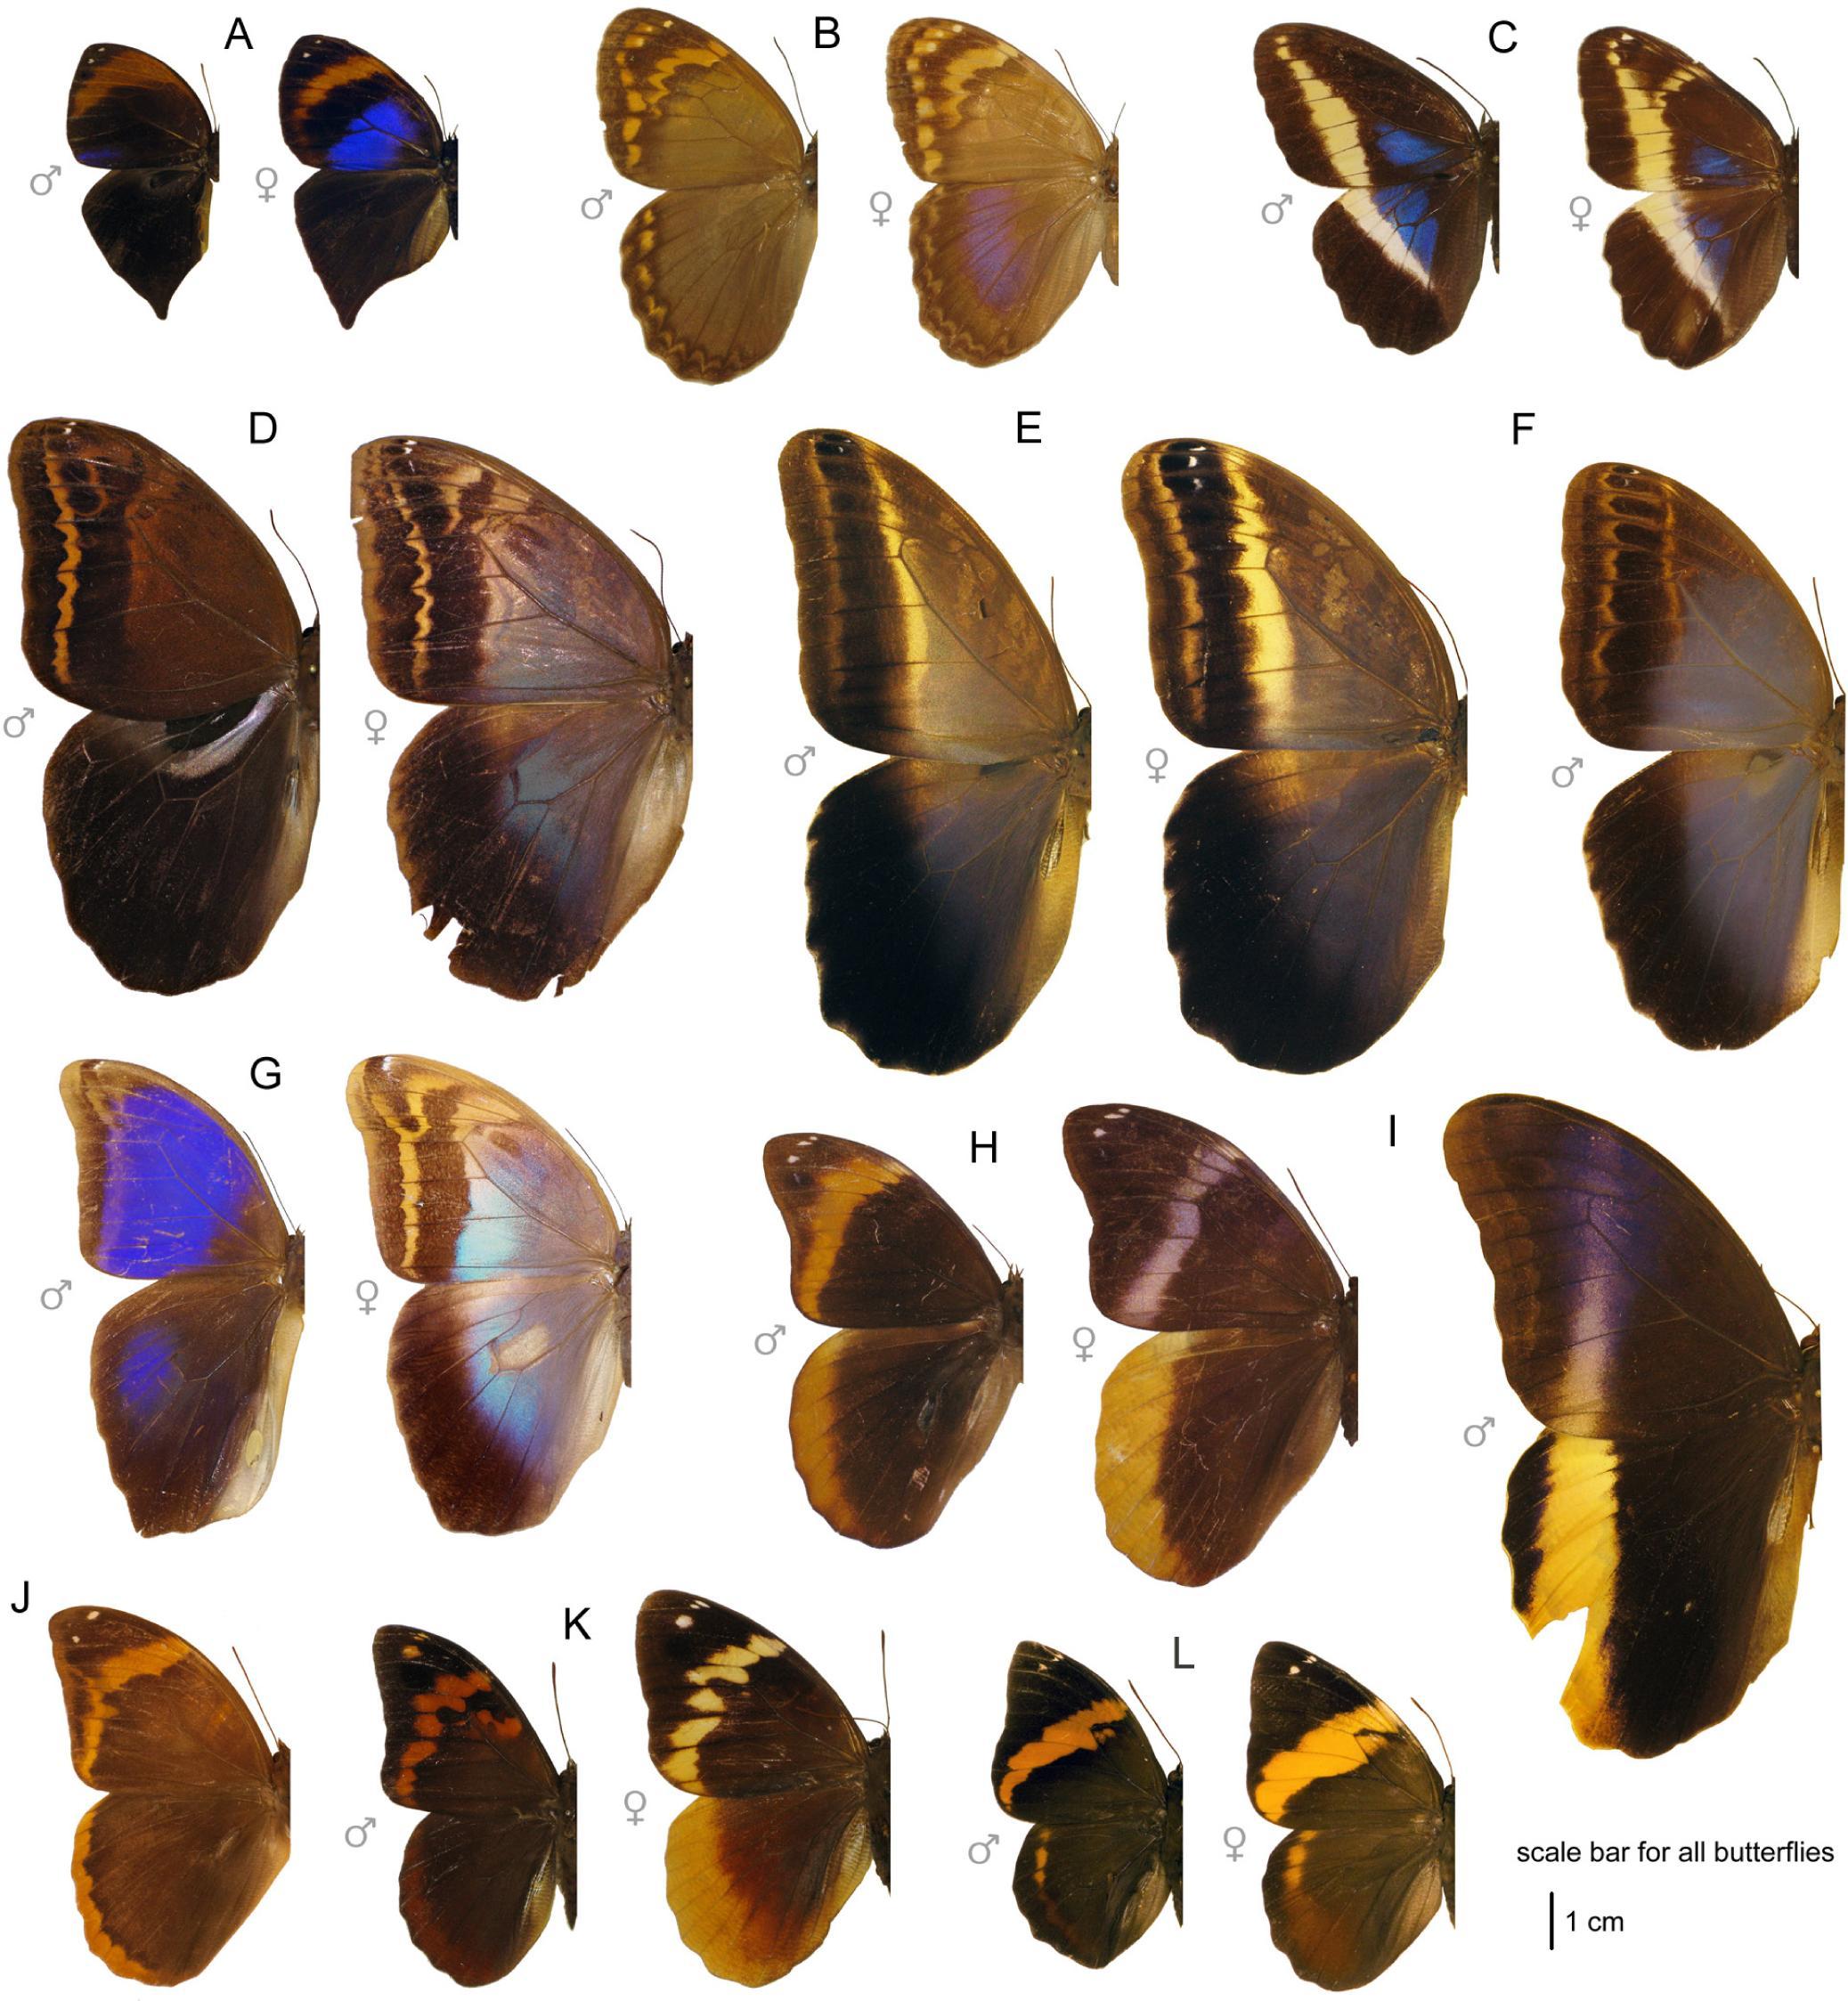 Wing pattern diversity in Brassolini butterflies (Nymphalidae.